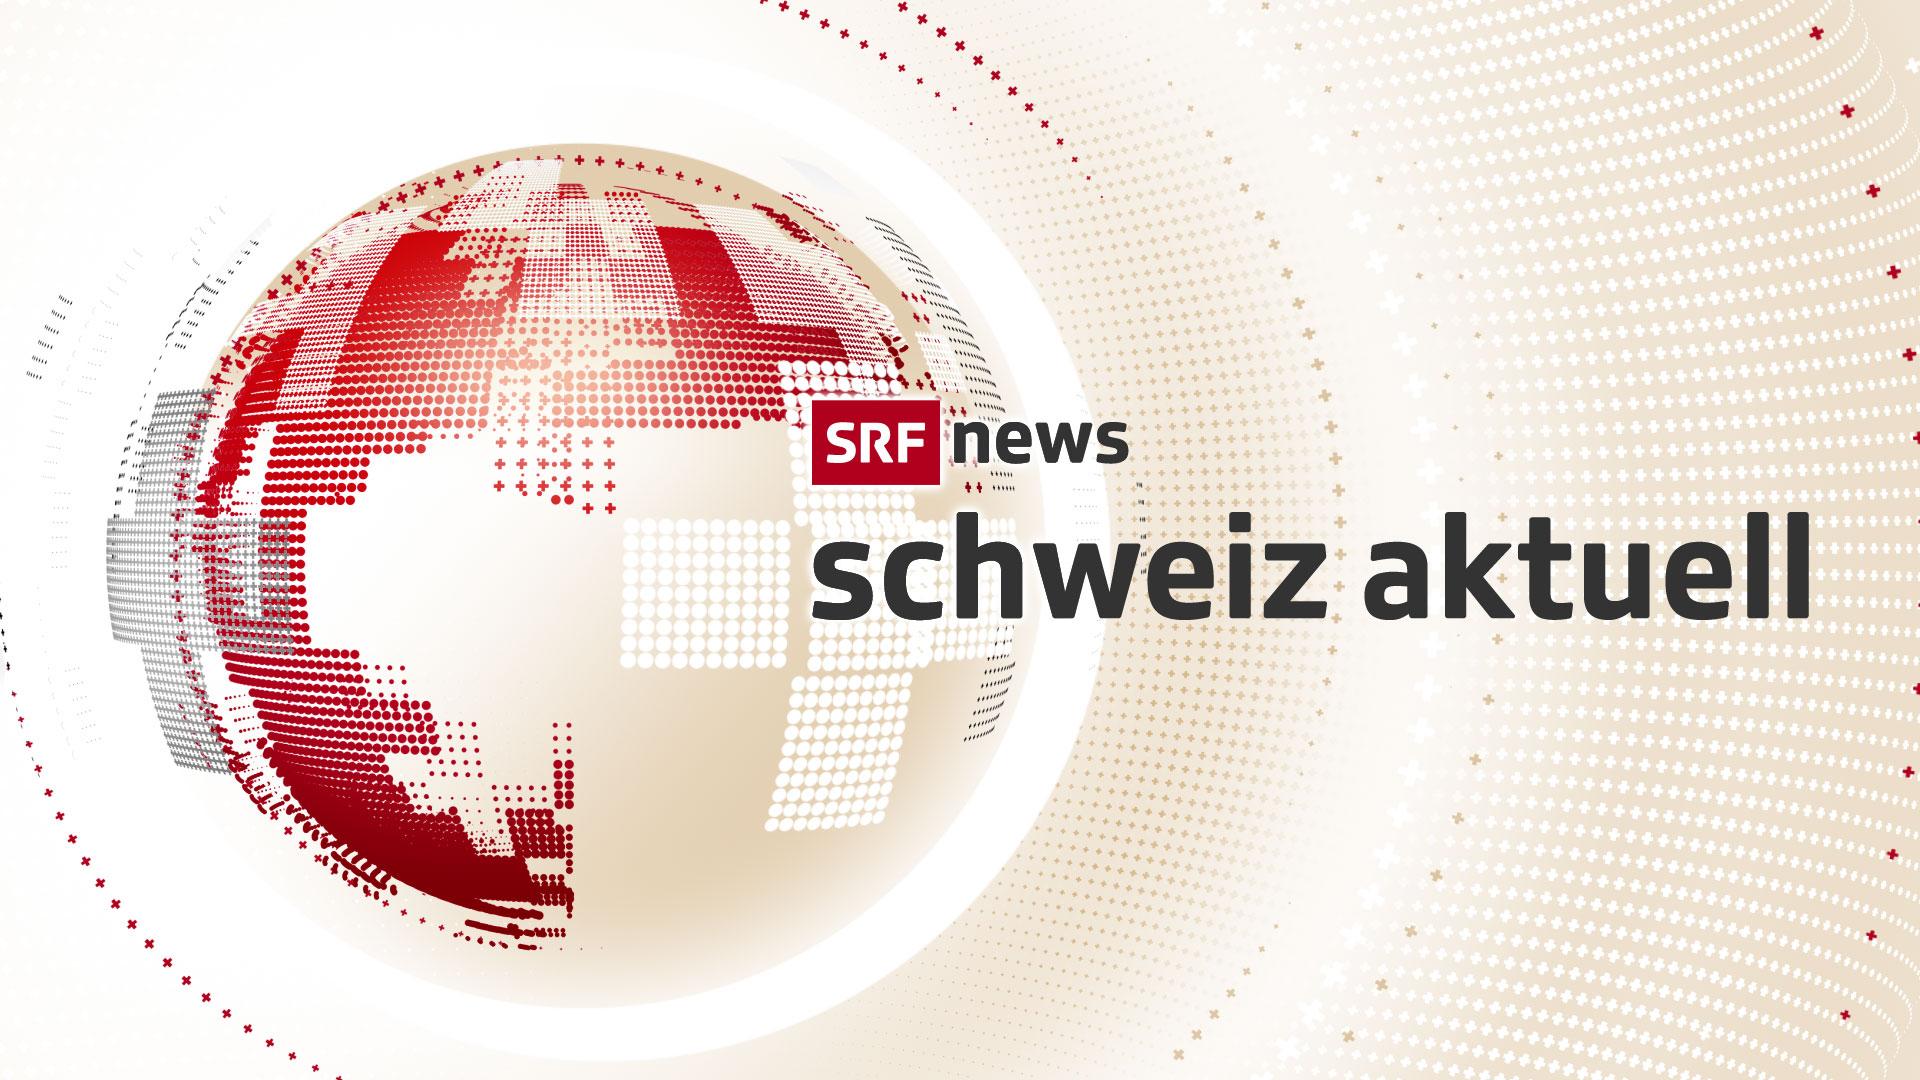 SRF-News-Keyvisual-SchweizAktuell